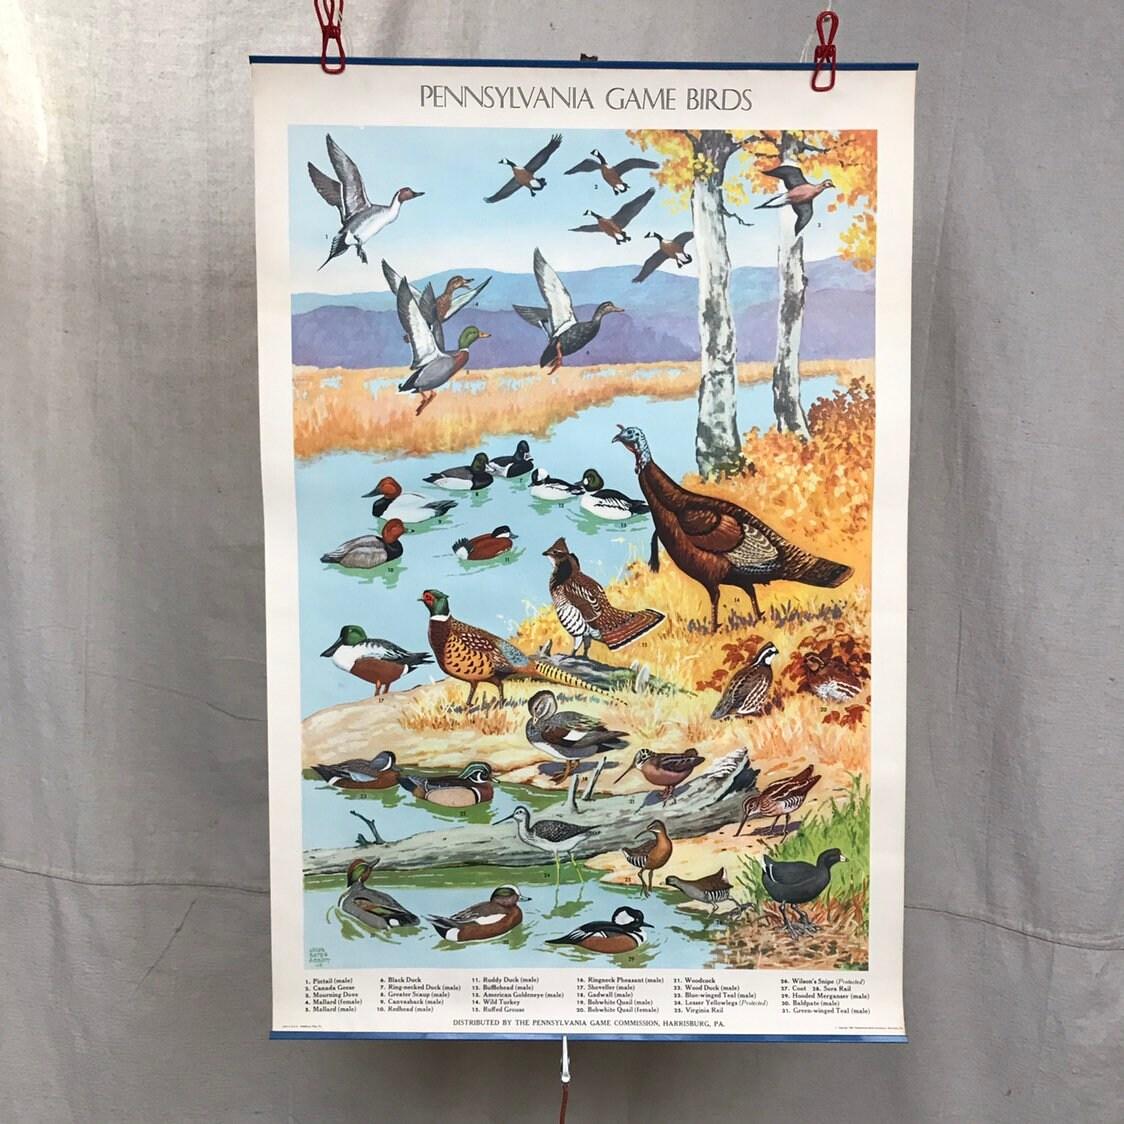 School Poster Game Birds Pennsylvania Water Fowl 1946 Penn Game Commission  Ducks Turkeys Jacob Bates Abbott Illustrator